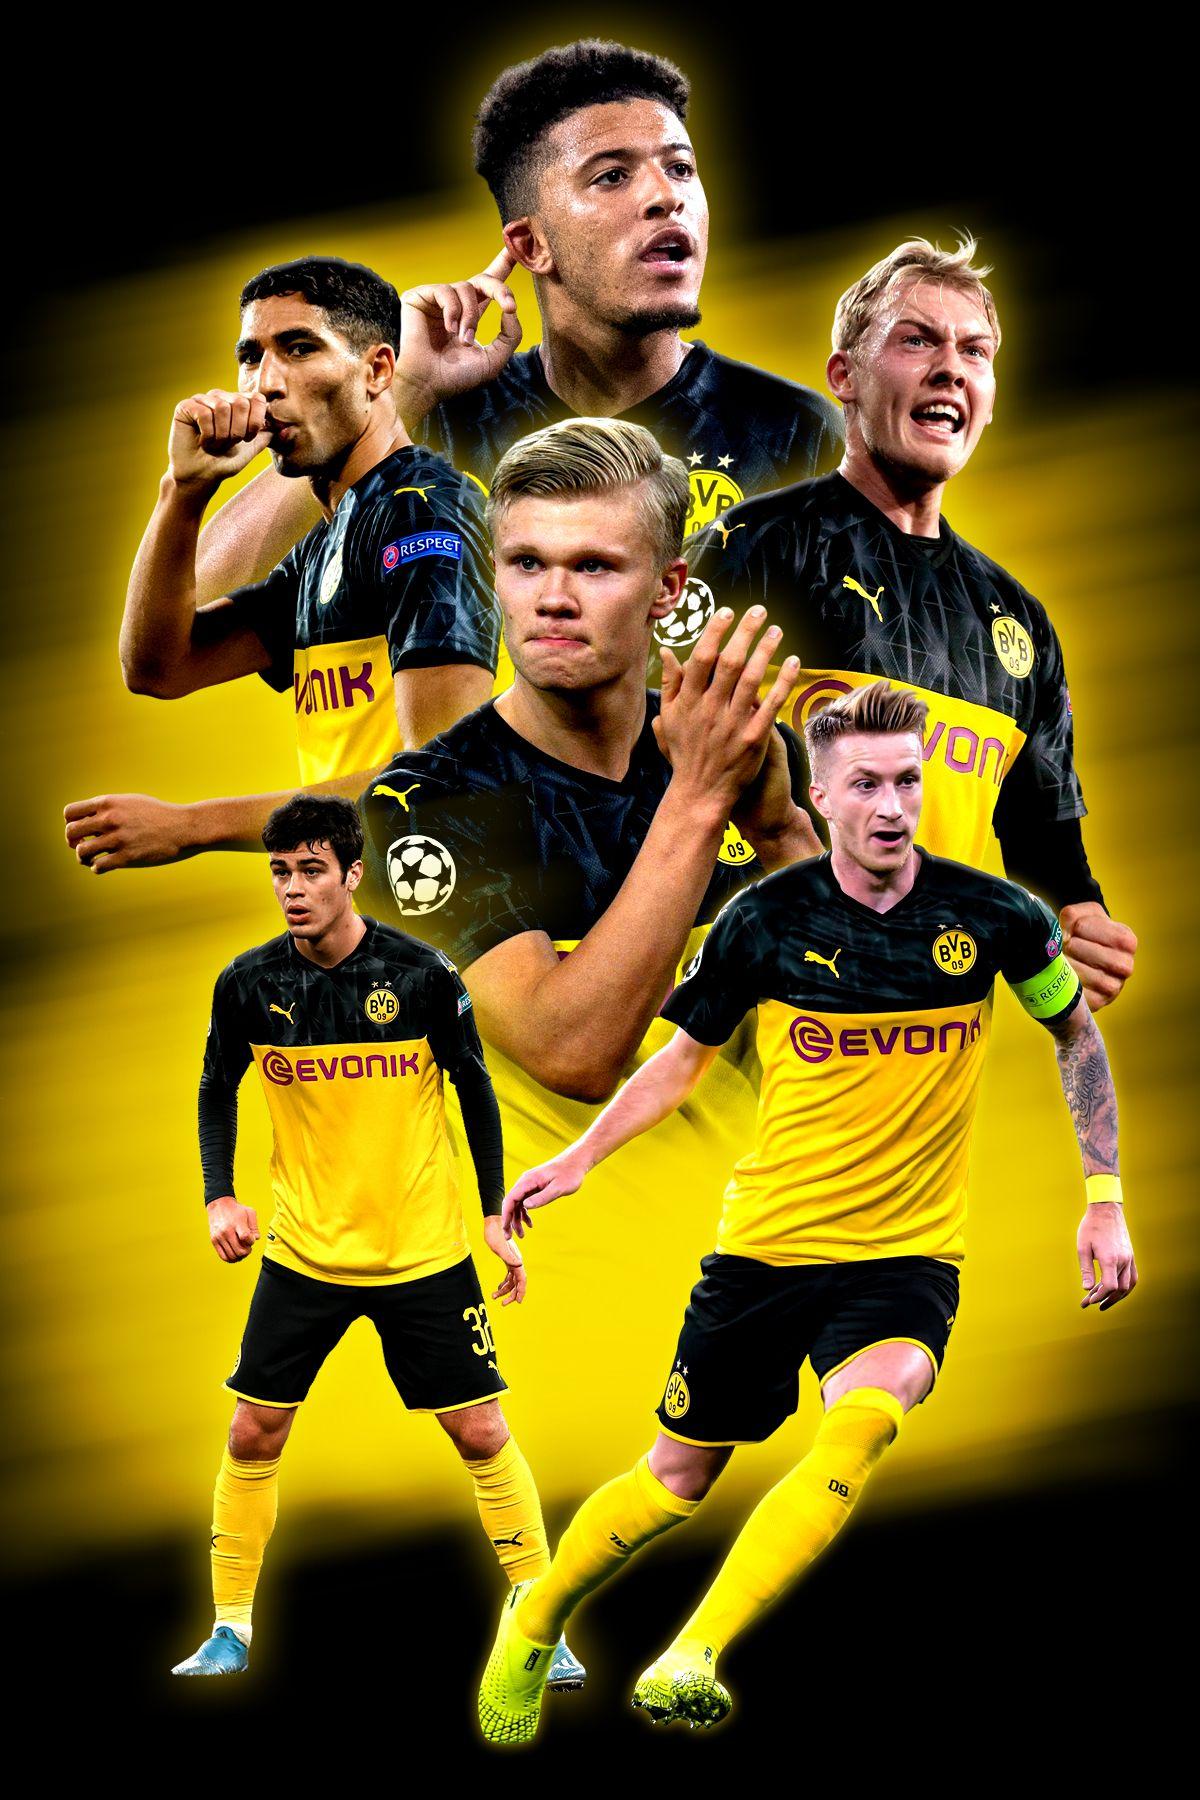 Borussia Dortmund Poster In 2020 Soccer Guys Soccer Photography Football Wallpaper